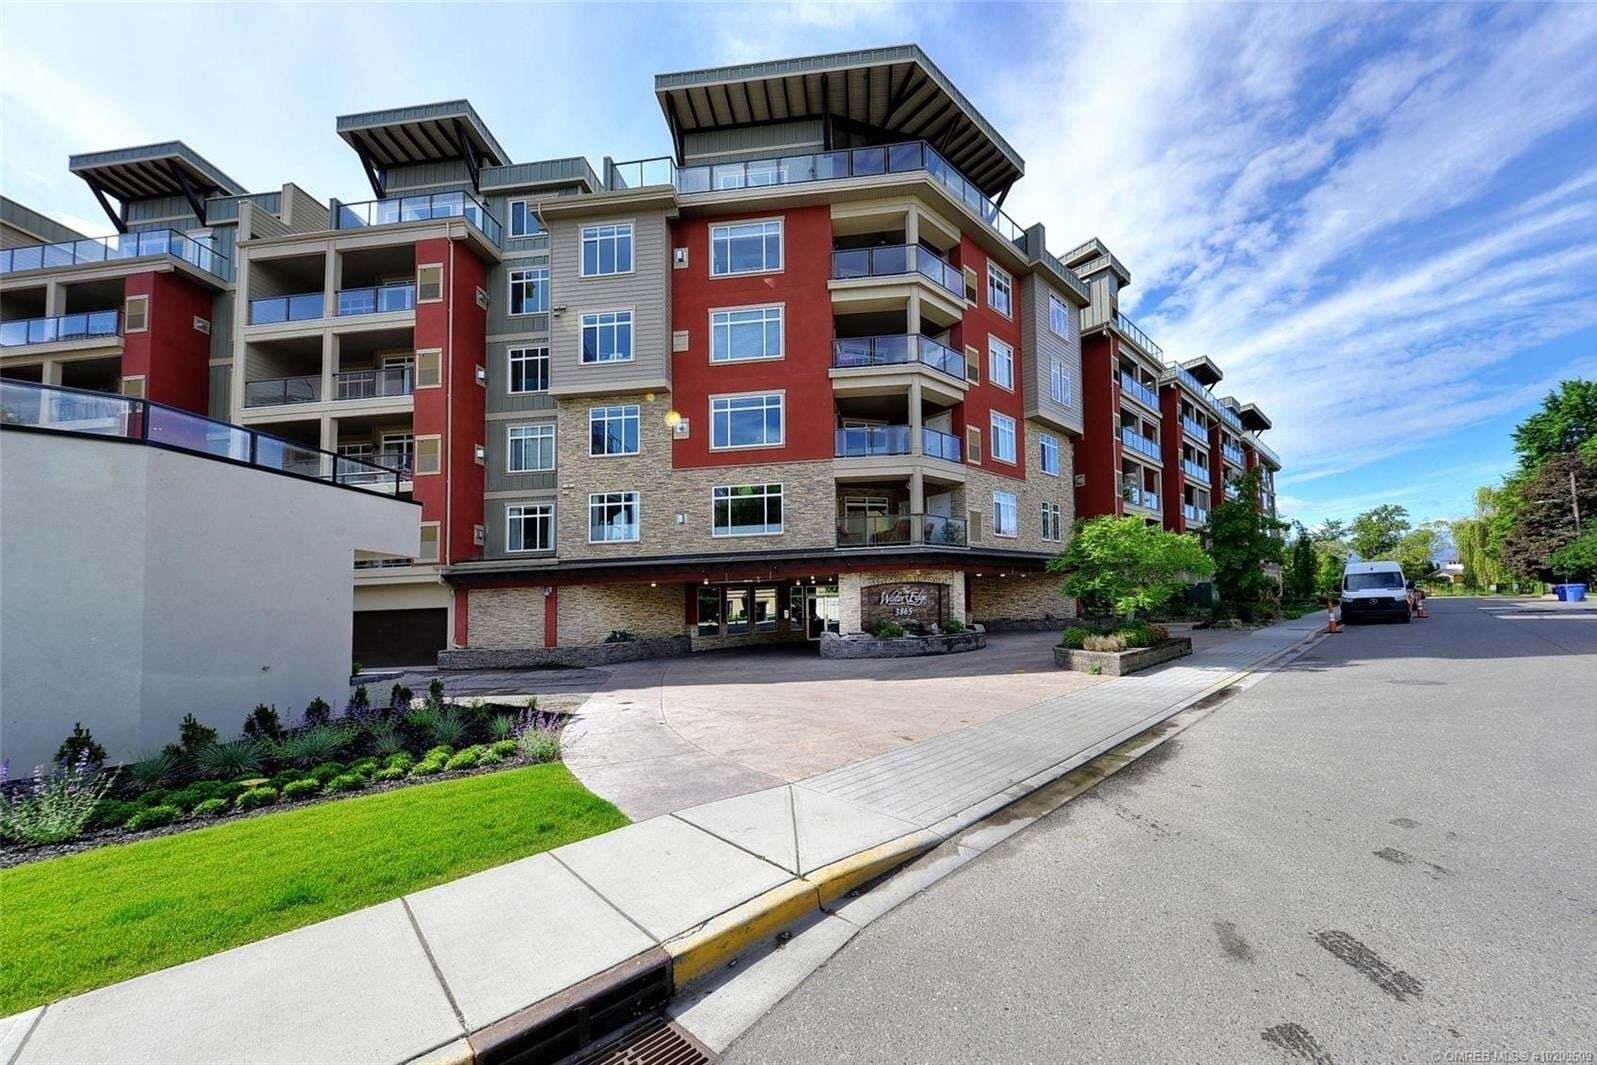 Condo for sale at 3865 Truswell Rd Kelowna British Columbia - MLS: 10209609